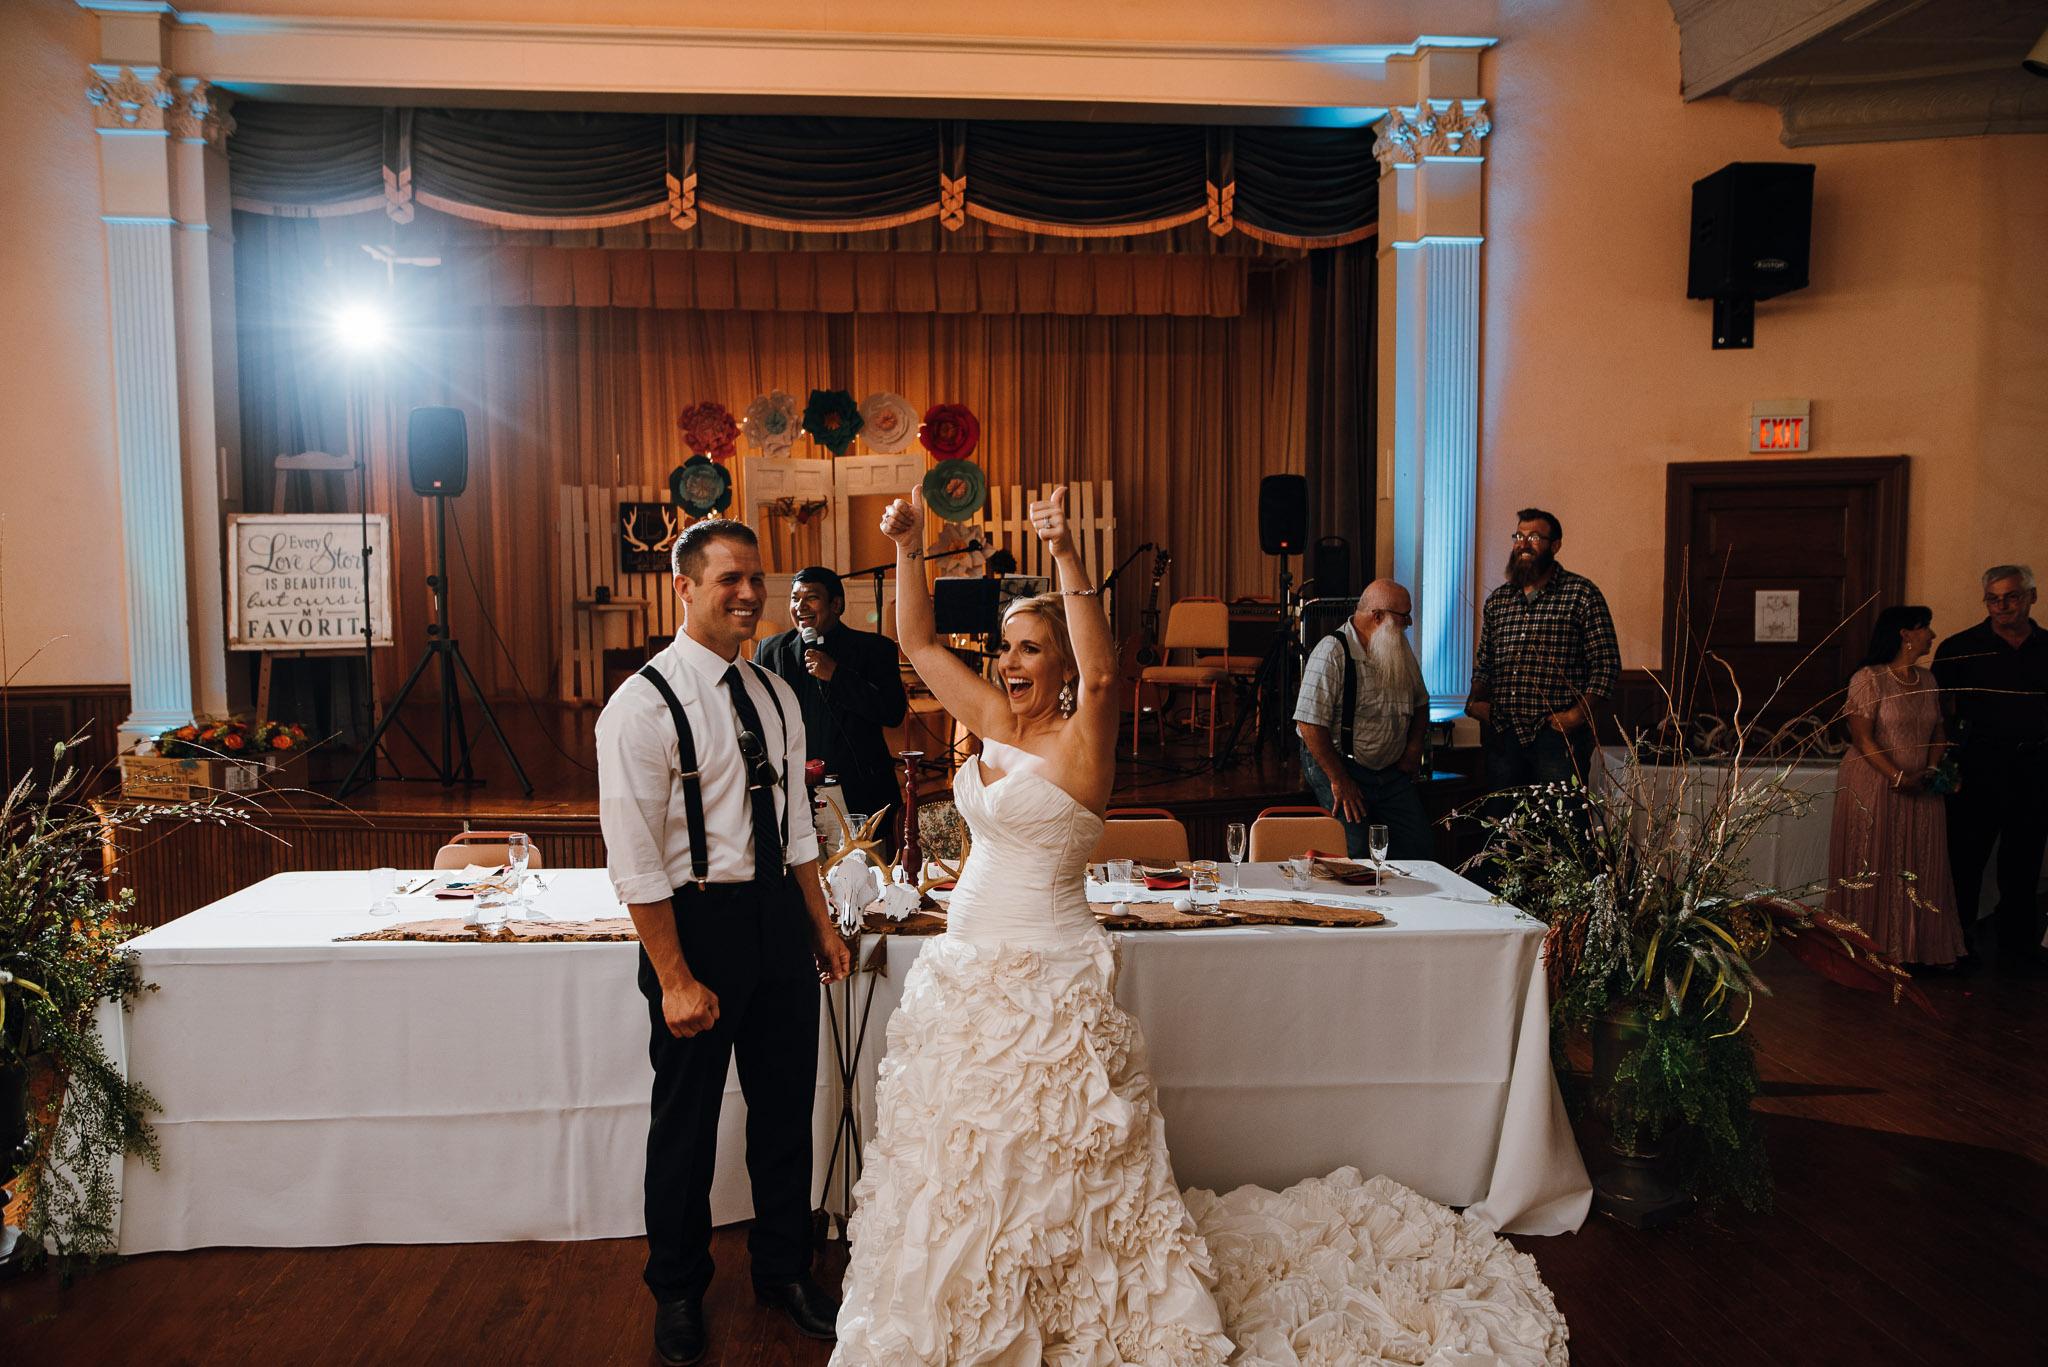 Rowena-West-Texas-Wedding-Photographer-Gillian&Ryan-0045.jpg